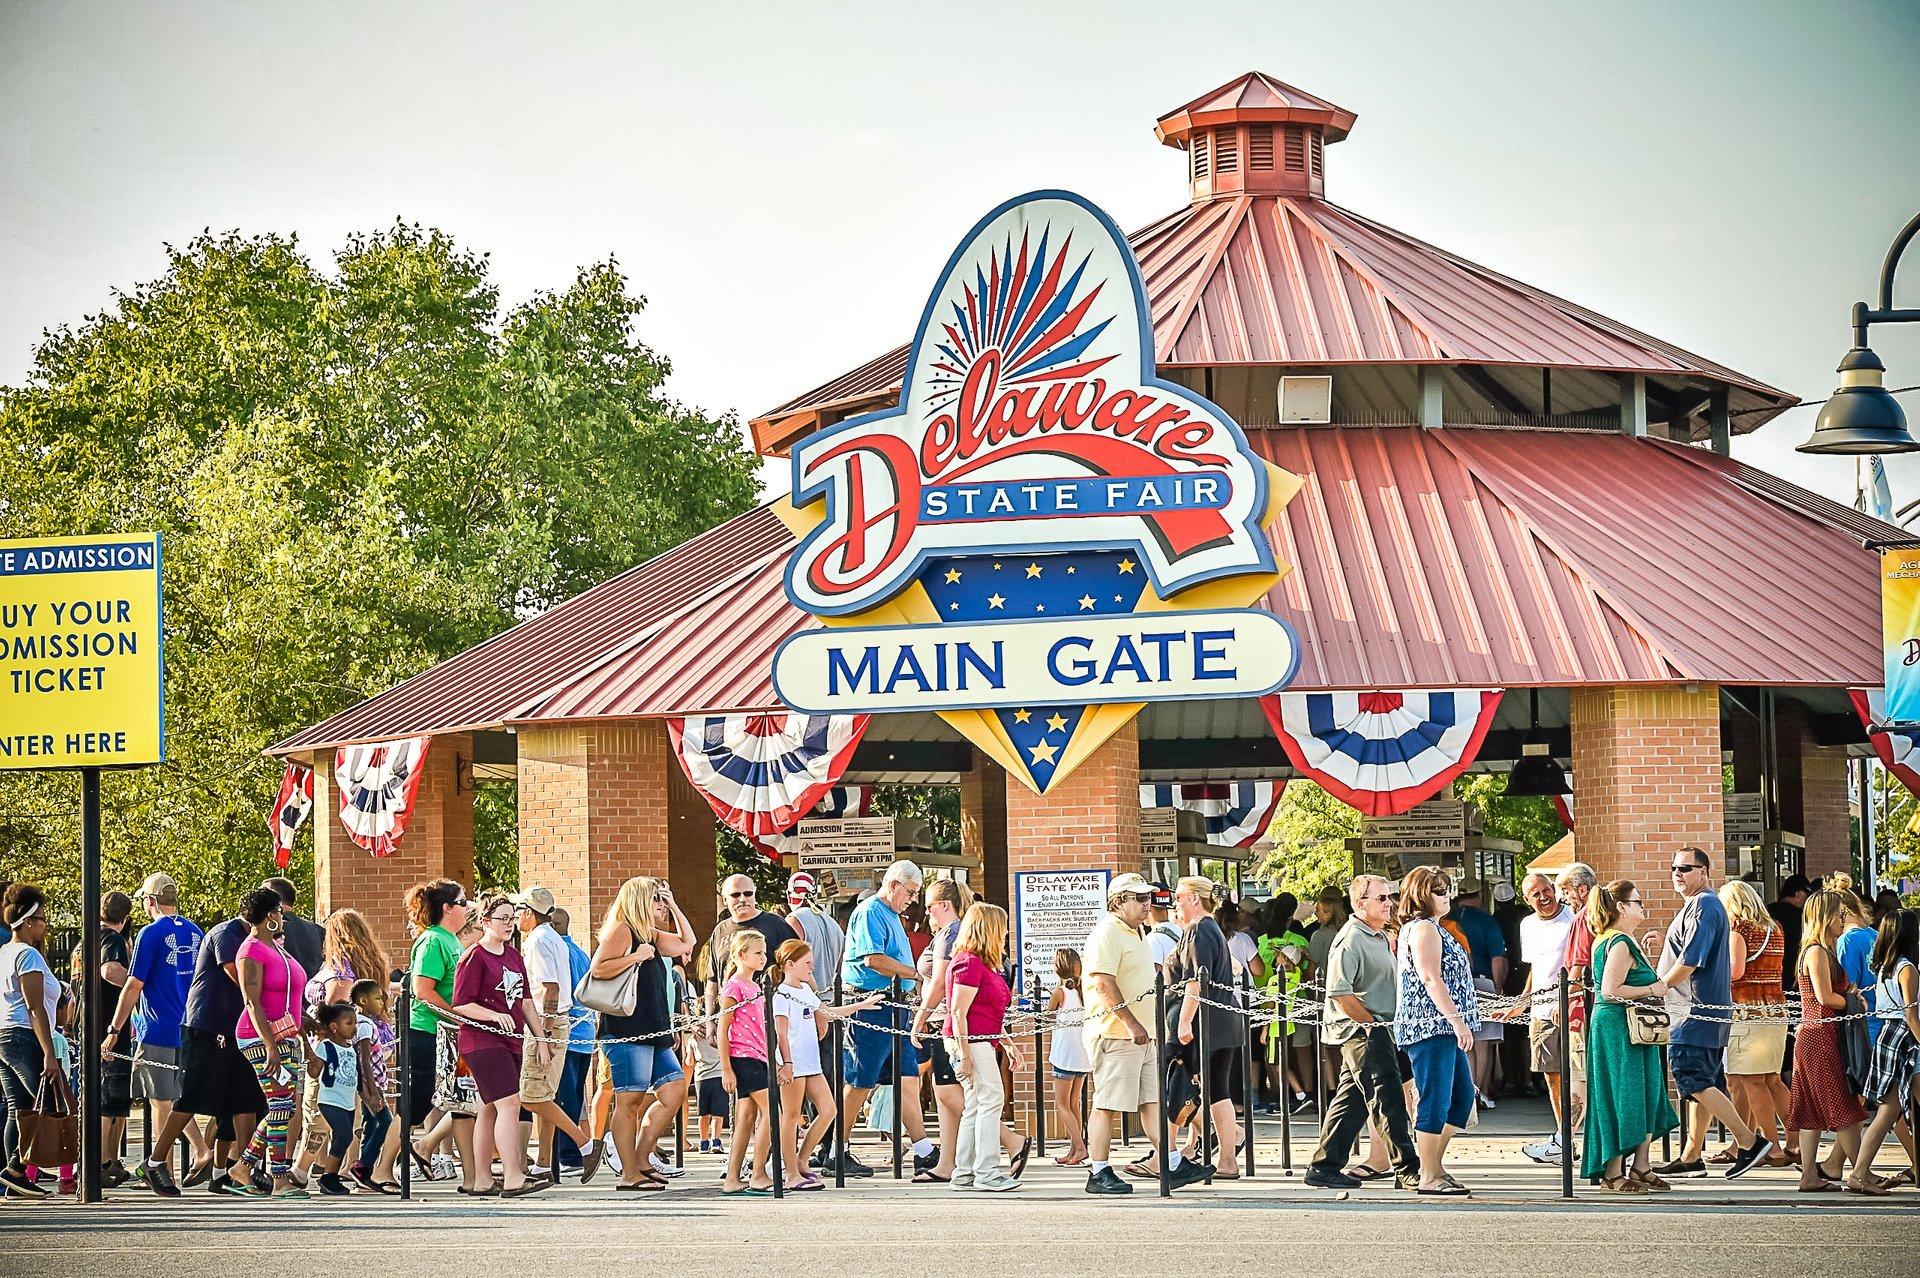 Delaware State Fair in Delaware 2020 - Best Time